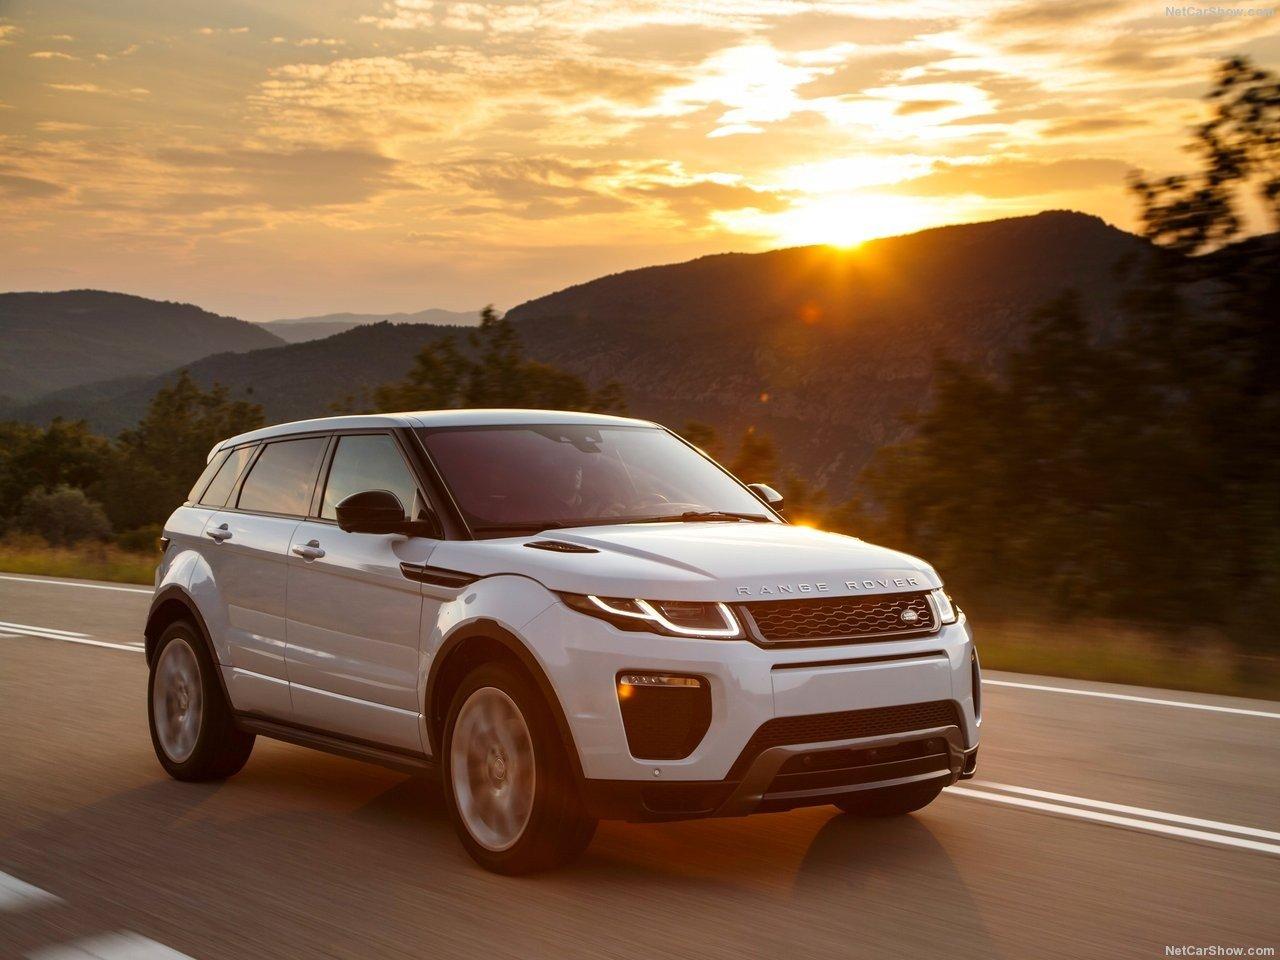 Range Rover Evoque Business Leasing Benefits